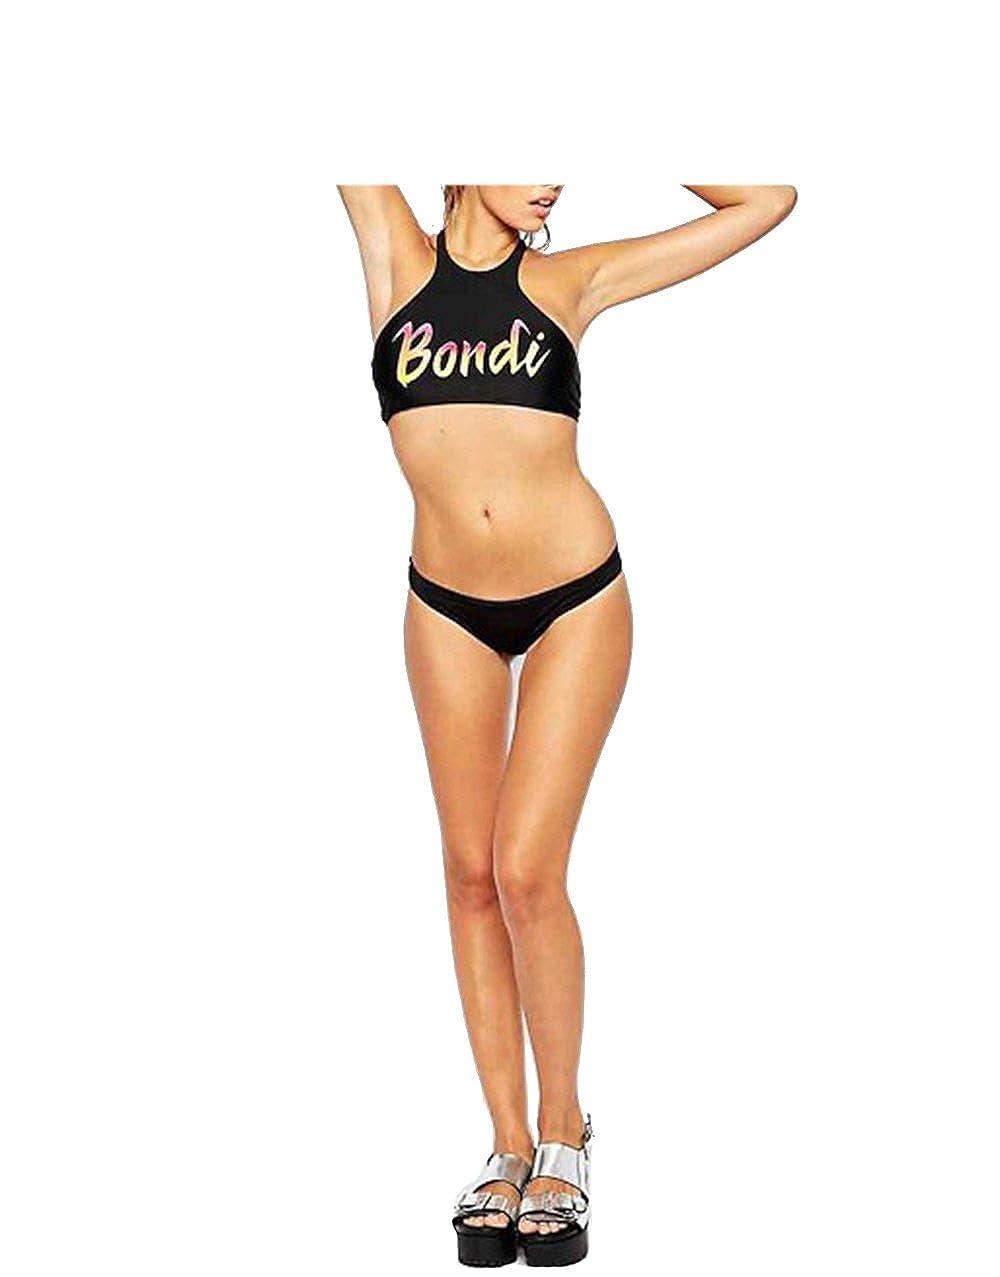 4d3ace8562 Amazon.com: Black Women Bikini Bondi Letters Print Beachwear Sexy Beach  Bathing Suits: Clothing